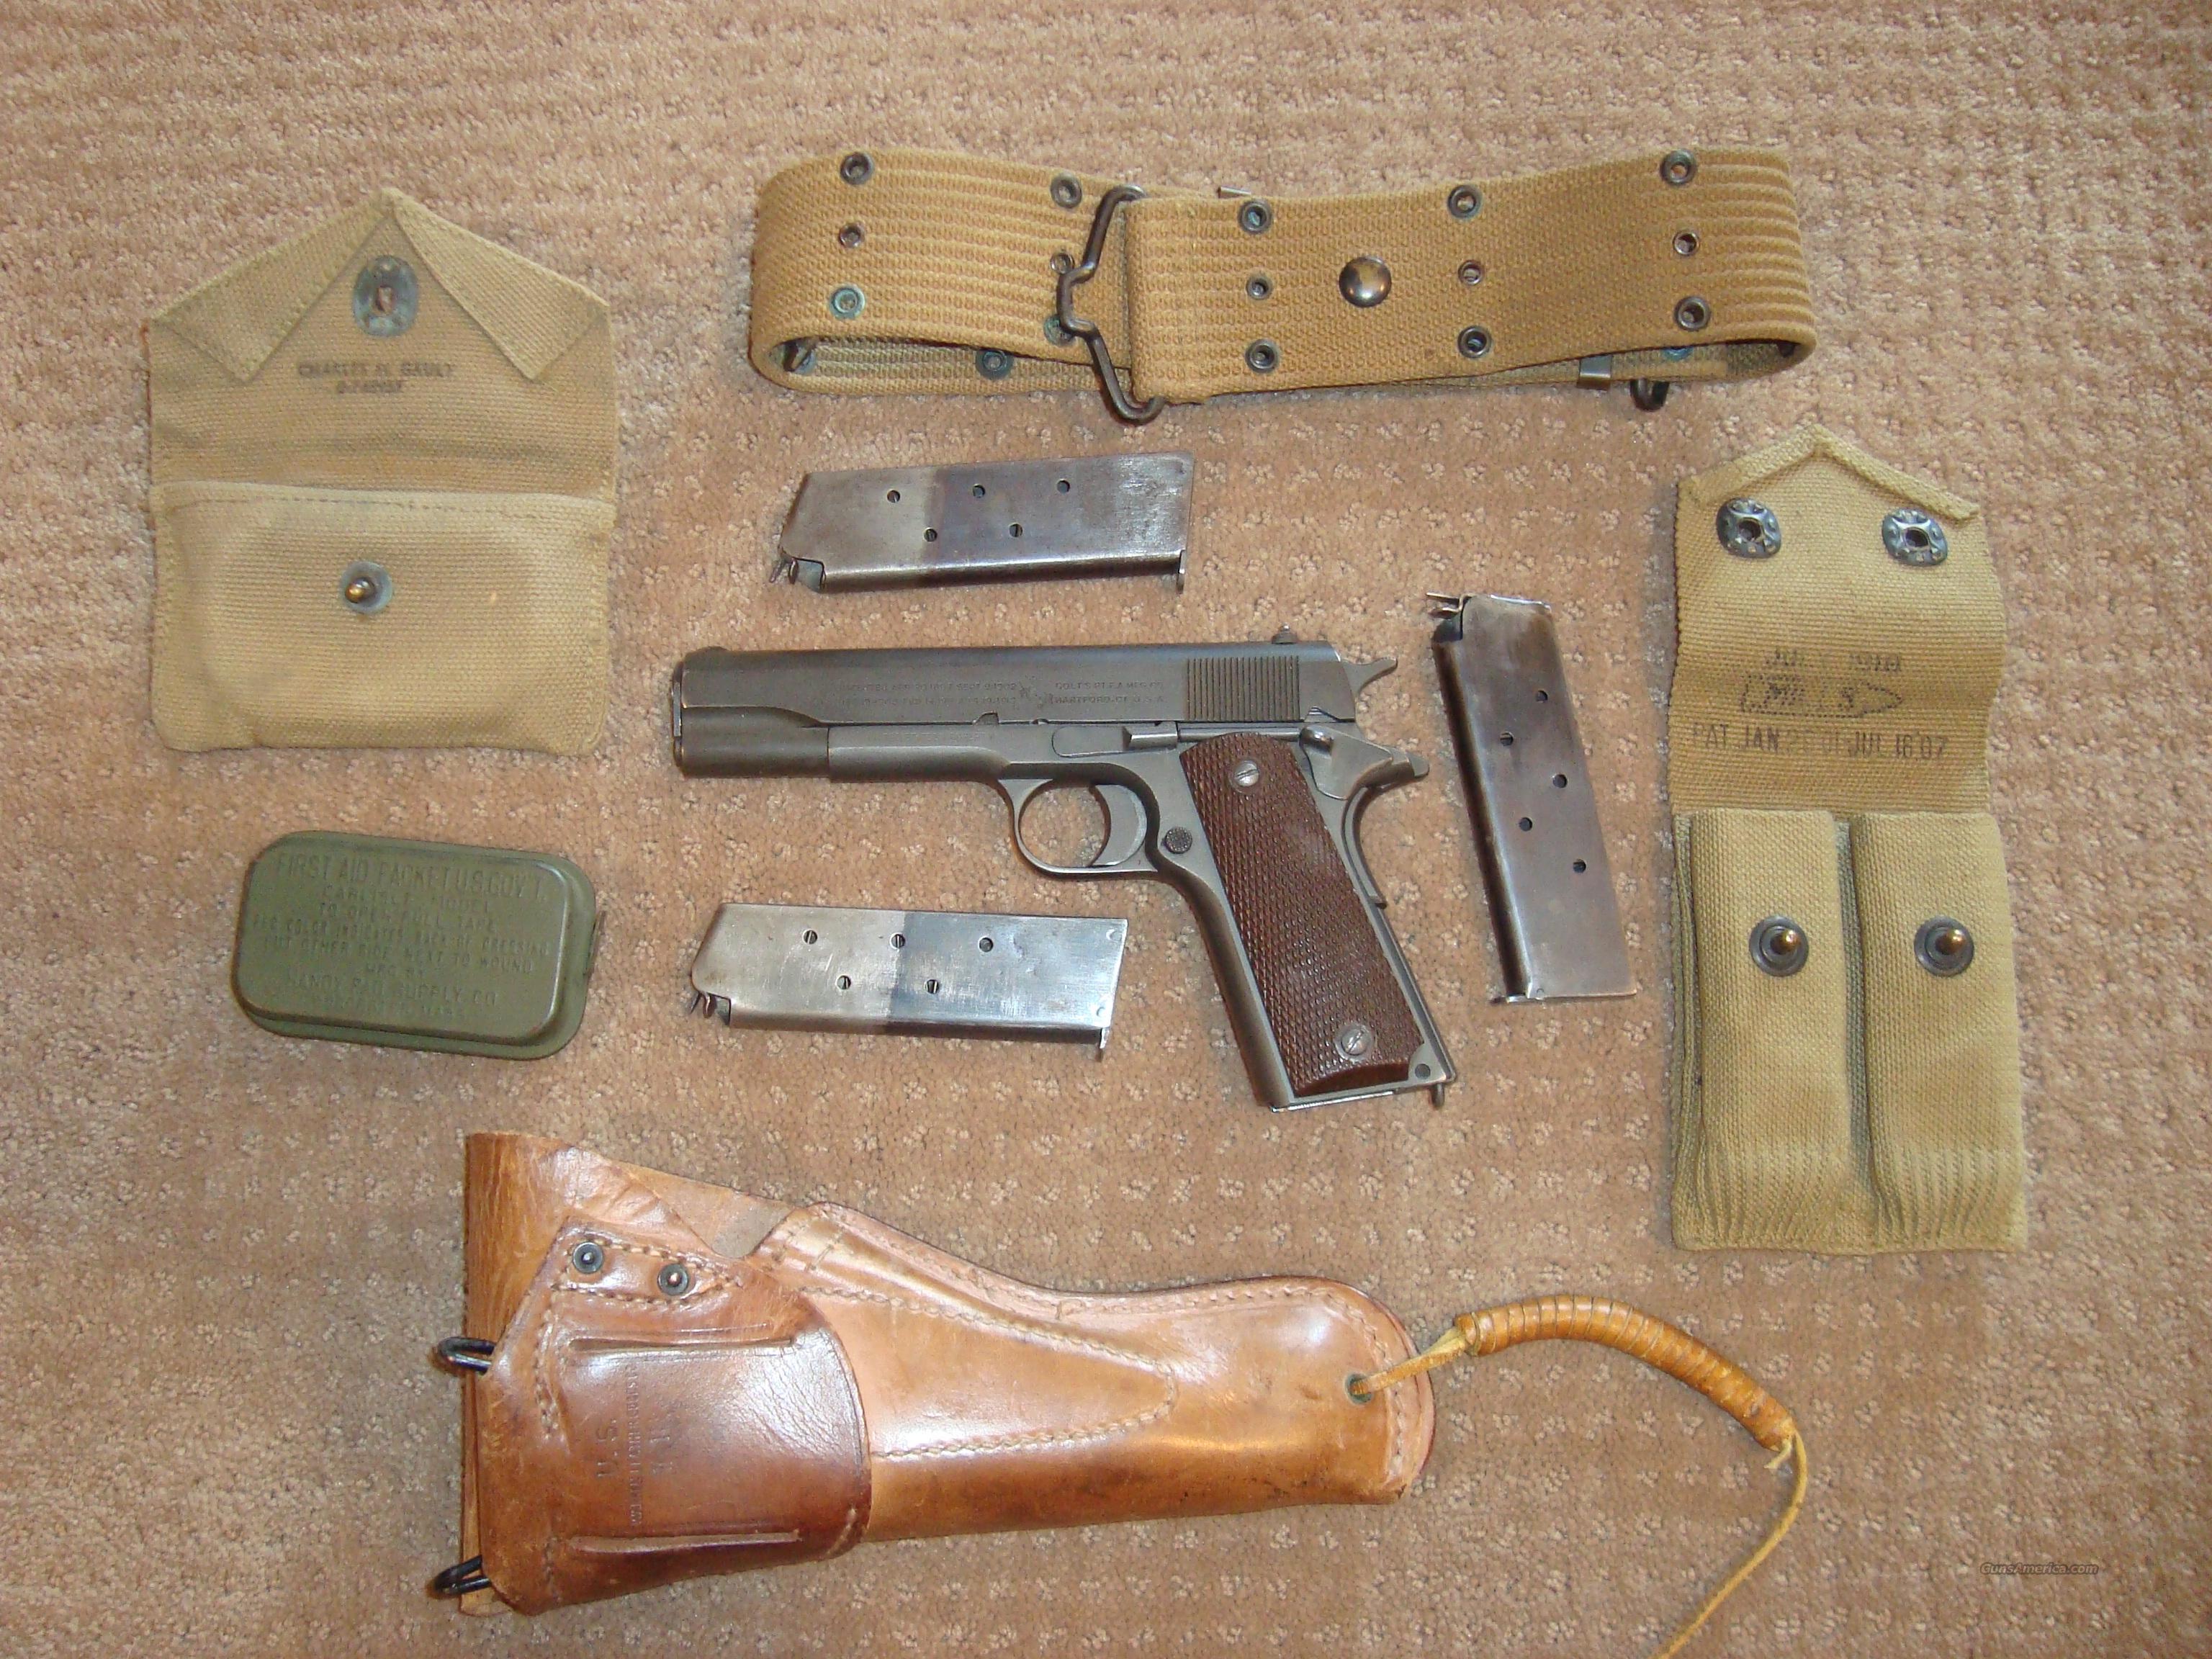 COMPLETE COLT 1911 RIG - WW2 WITH HOLSTER, BELT... for sale